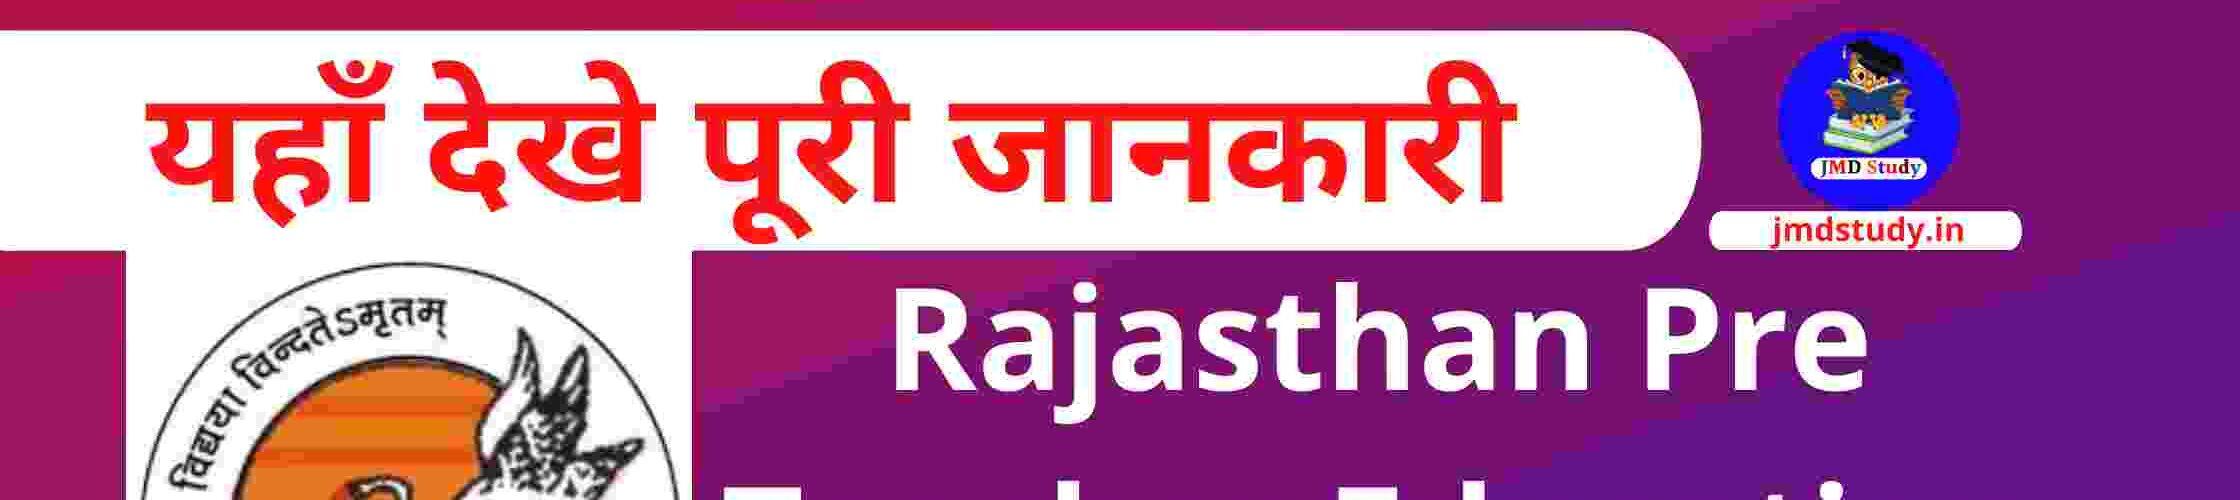 PTET Syllabus 2021 Rajasthan Pre Teacher Education Exam Pattern